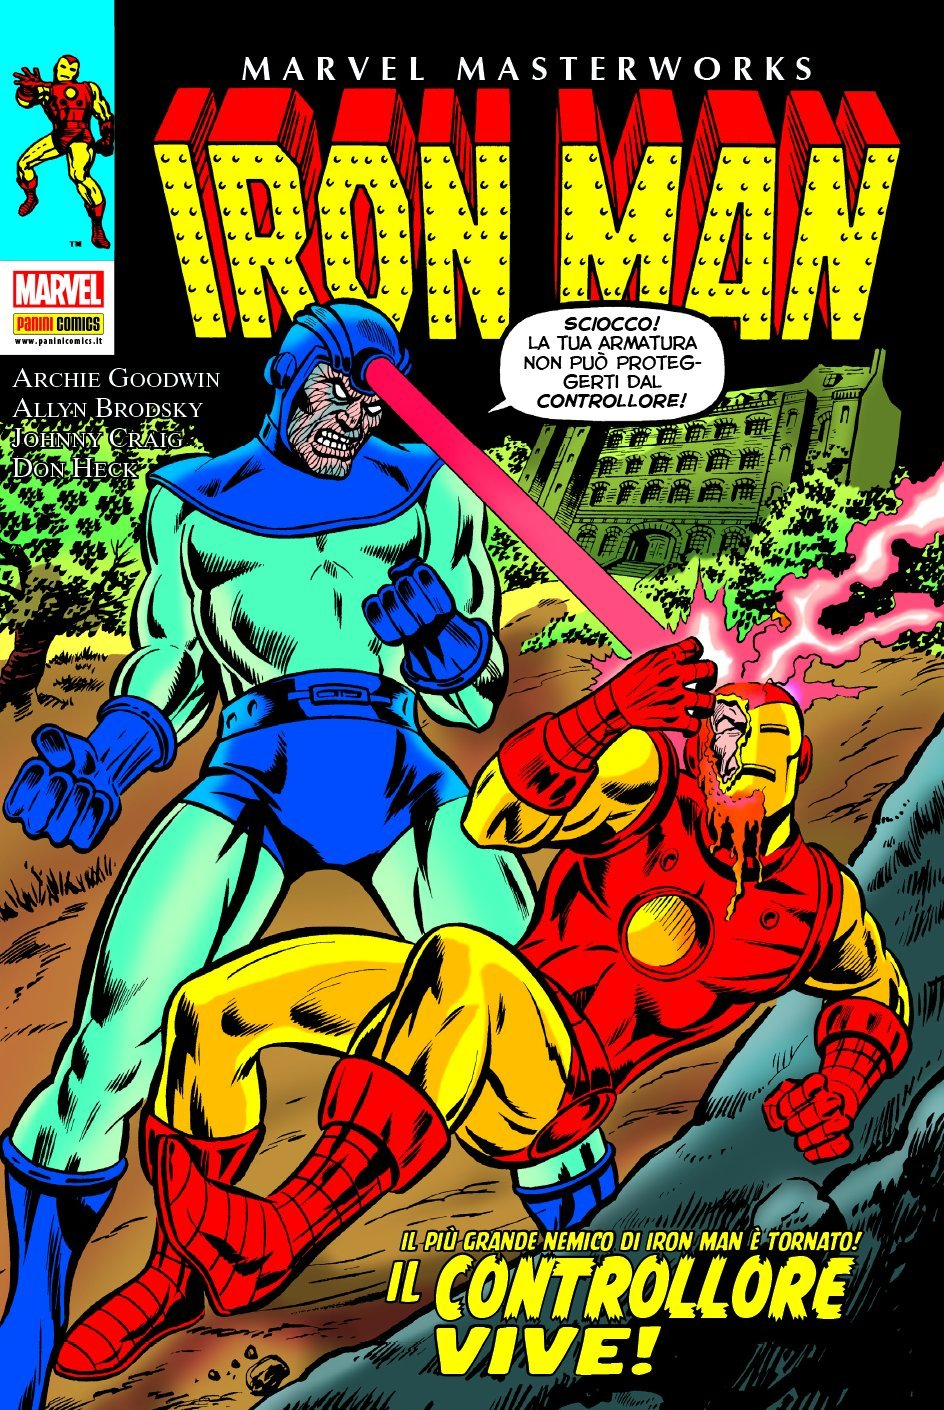 Marvel Masterworks: Iron Man vol. 6